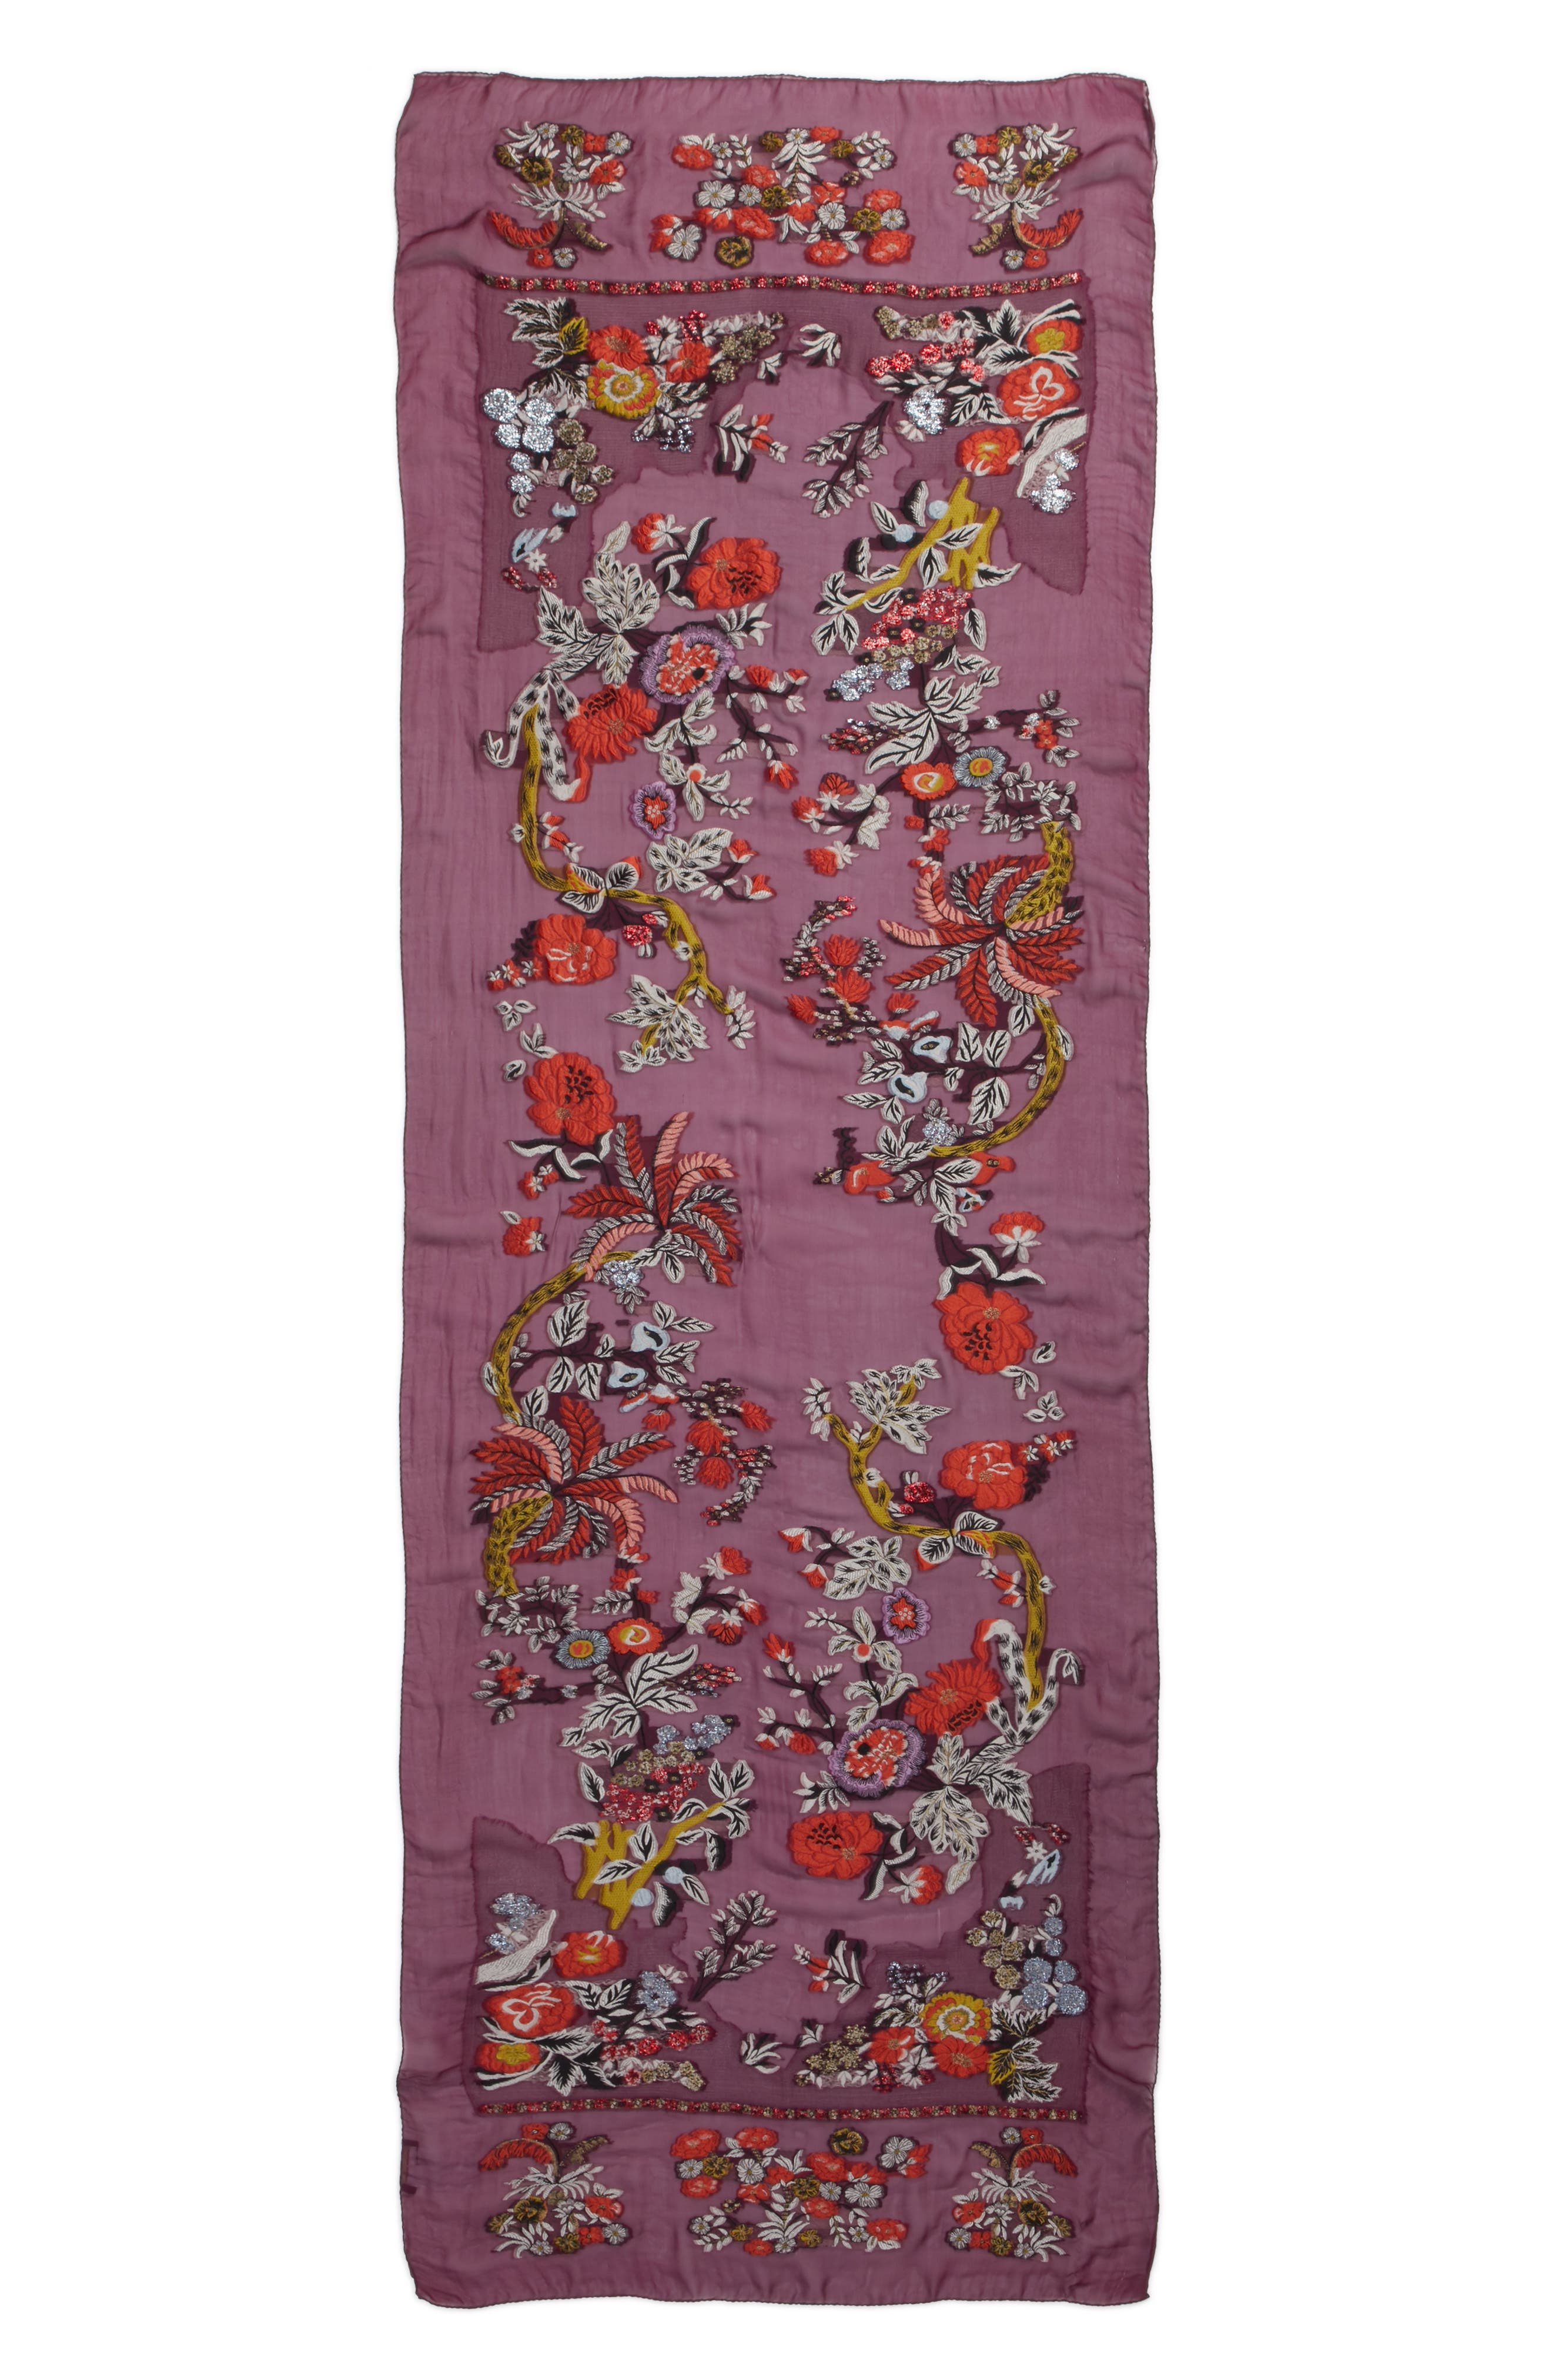 Maharaja Embroidered Wrap Scarf,                             Alternate thumbnail 3, color,                             PURPLE MULTI